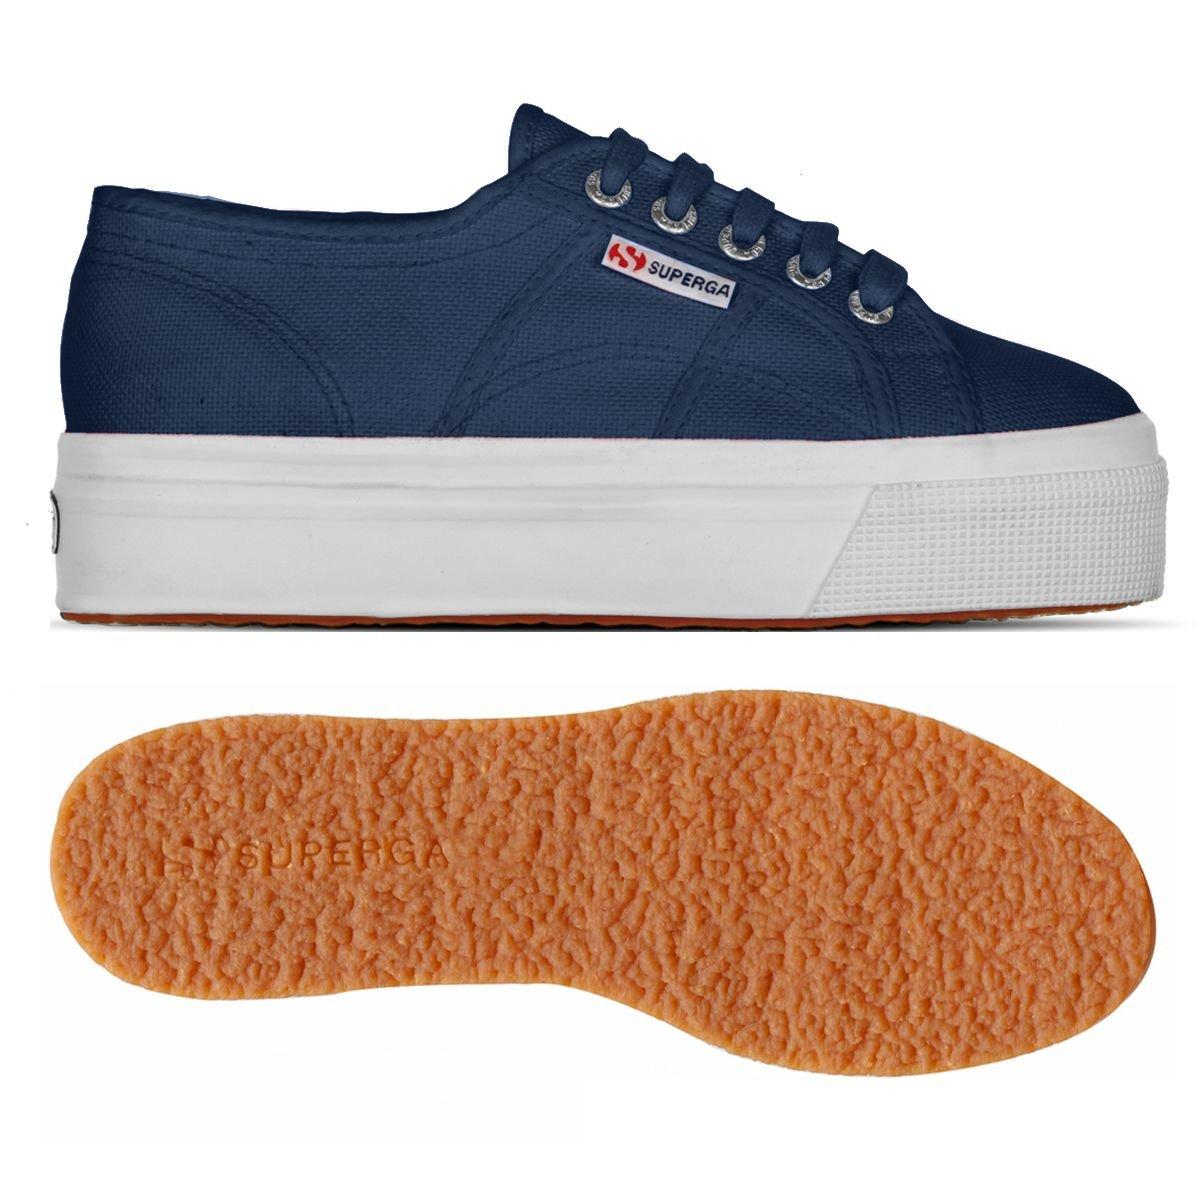 Superga Damen Acotw Linea Up and Down Sneaker Blau Md Cobalt